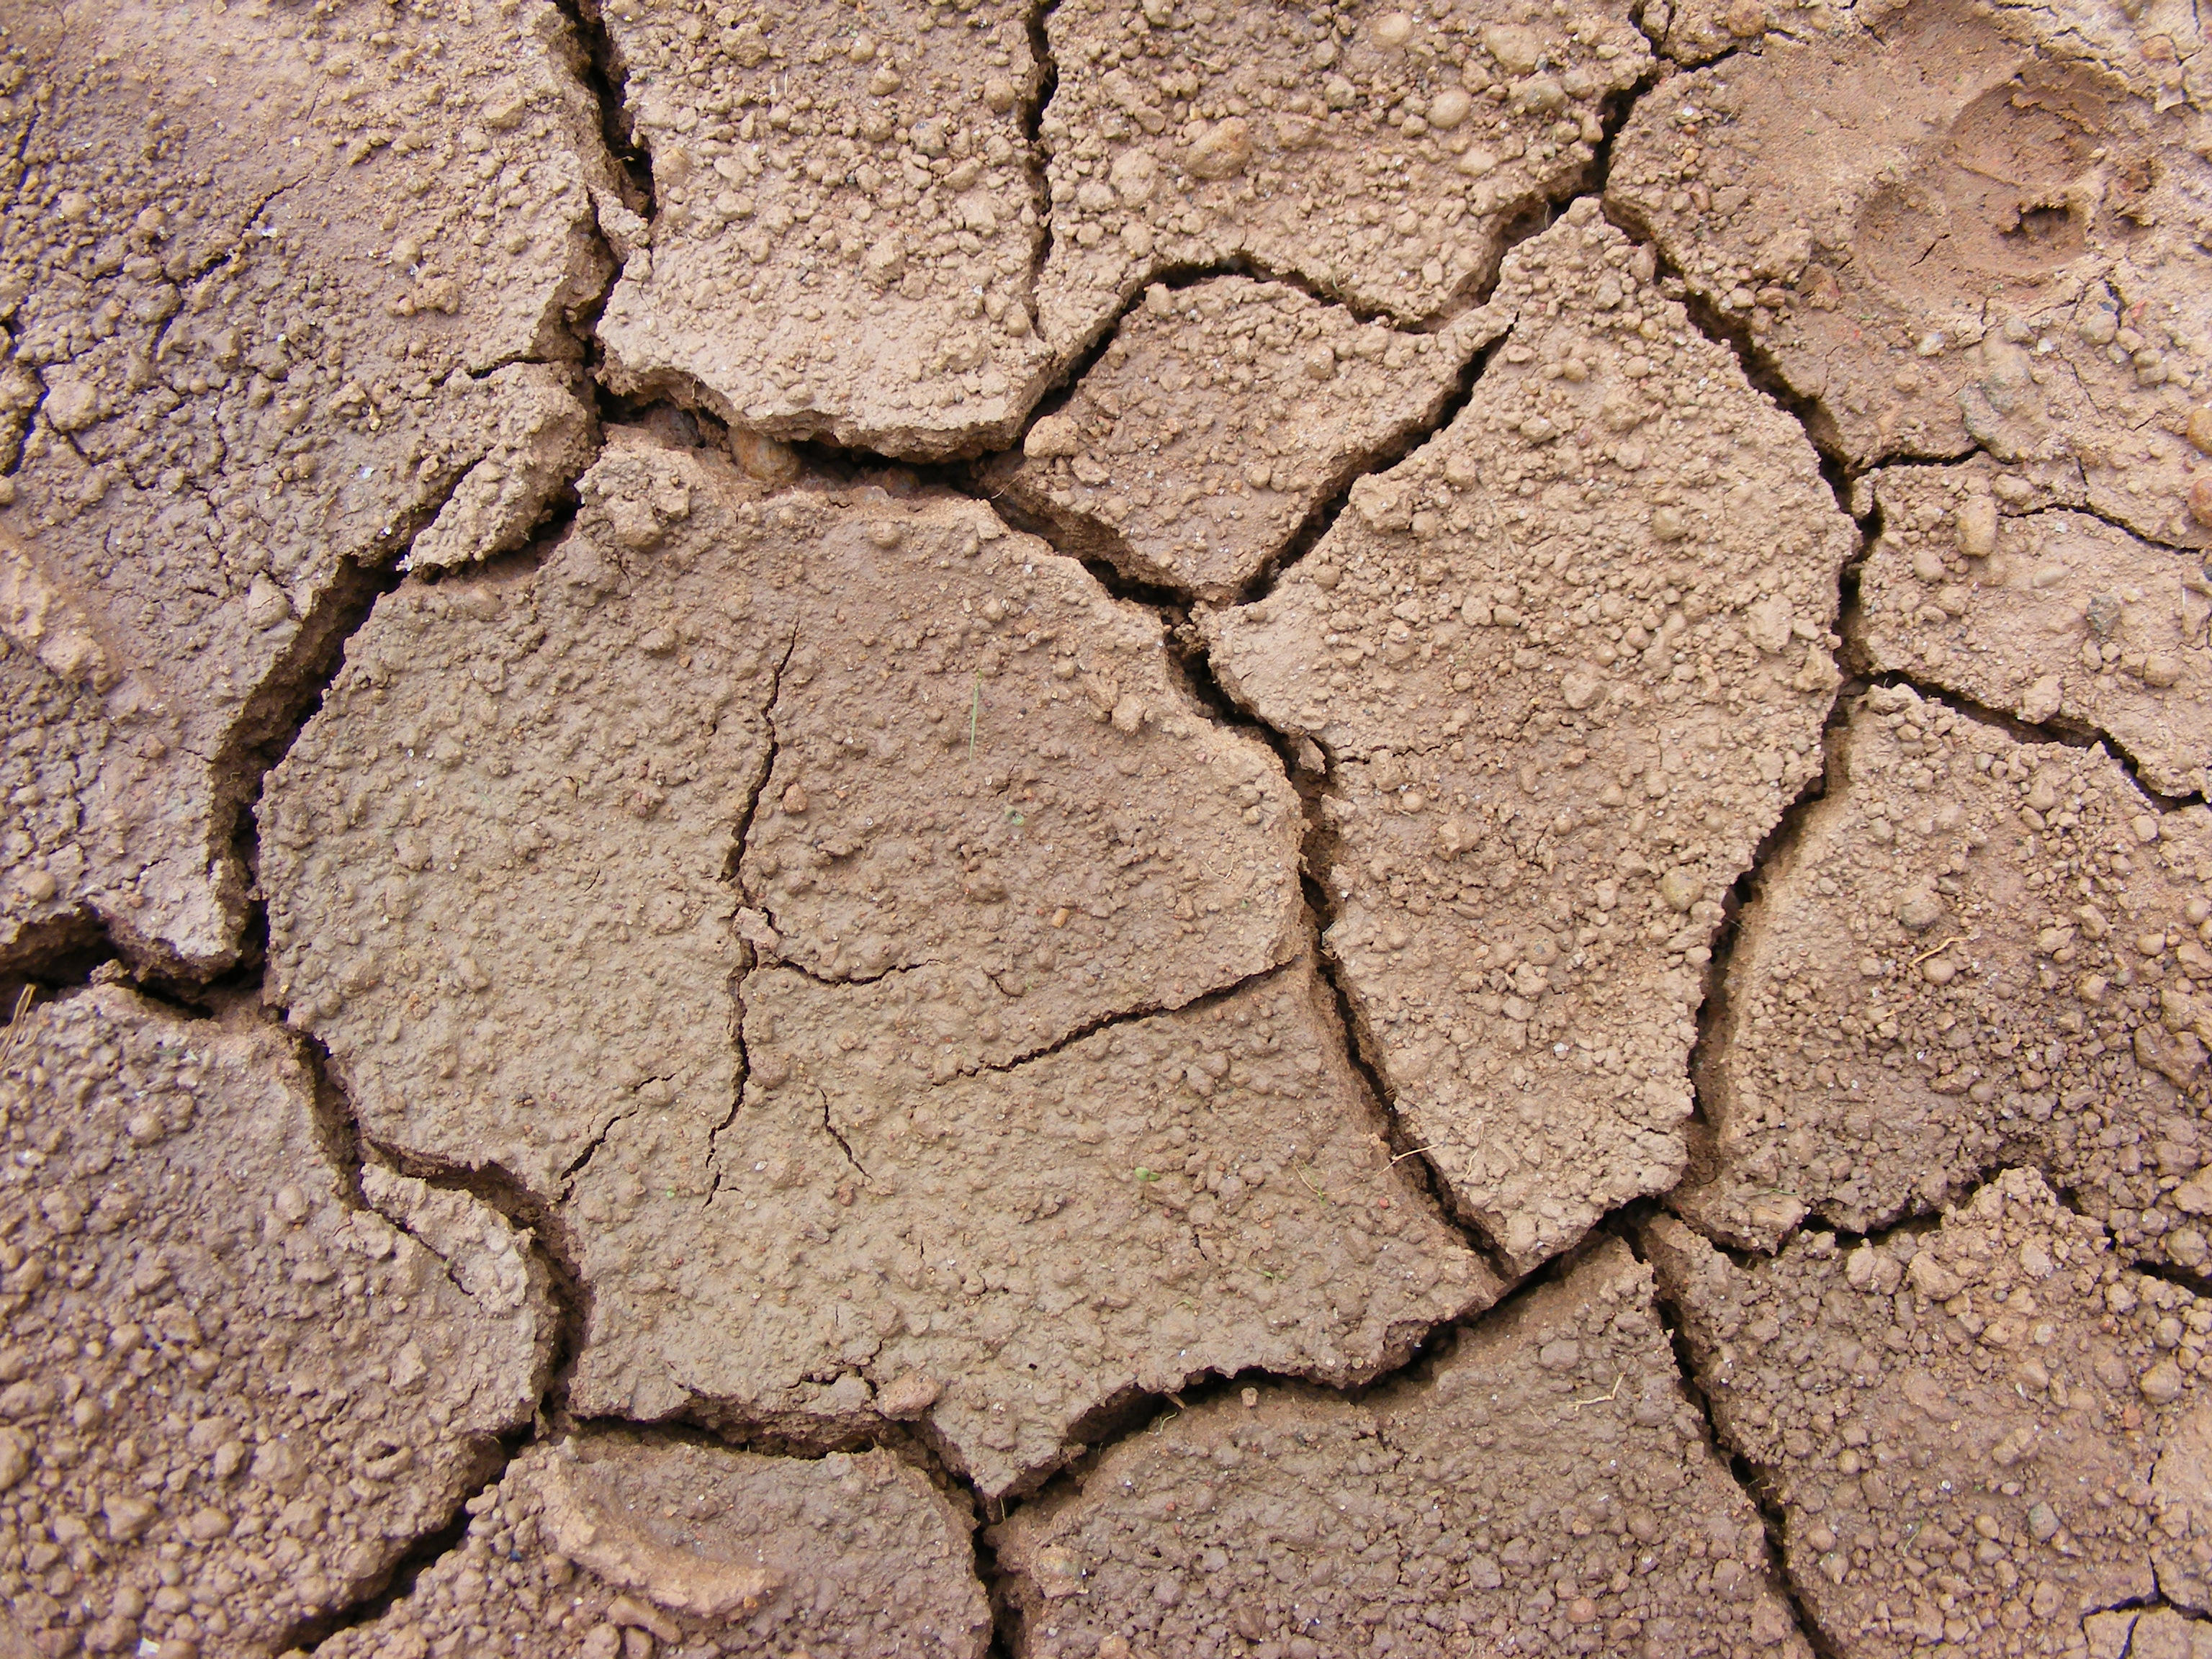 Cracked Soil by Artfans